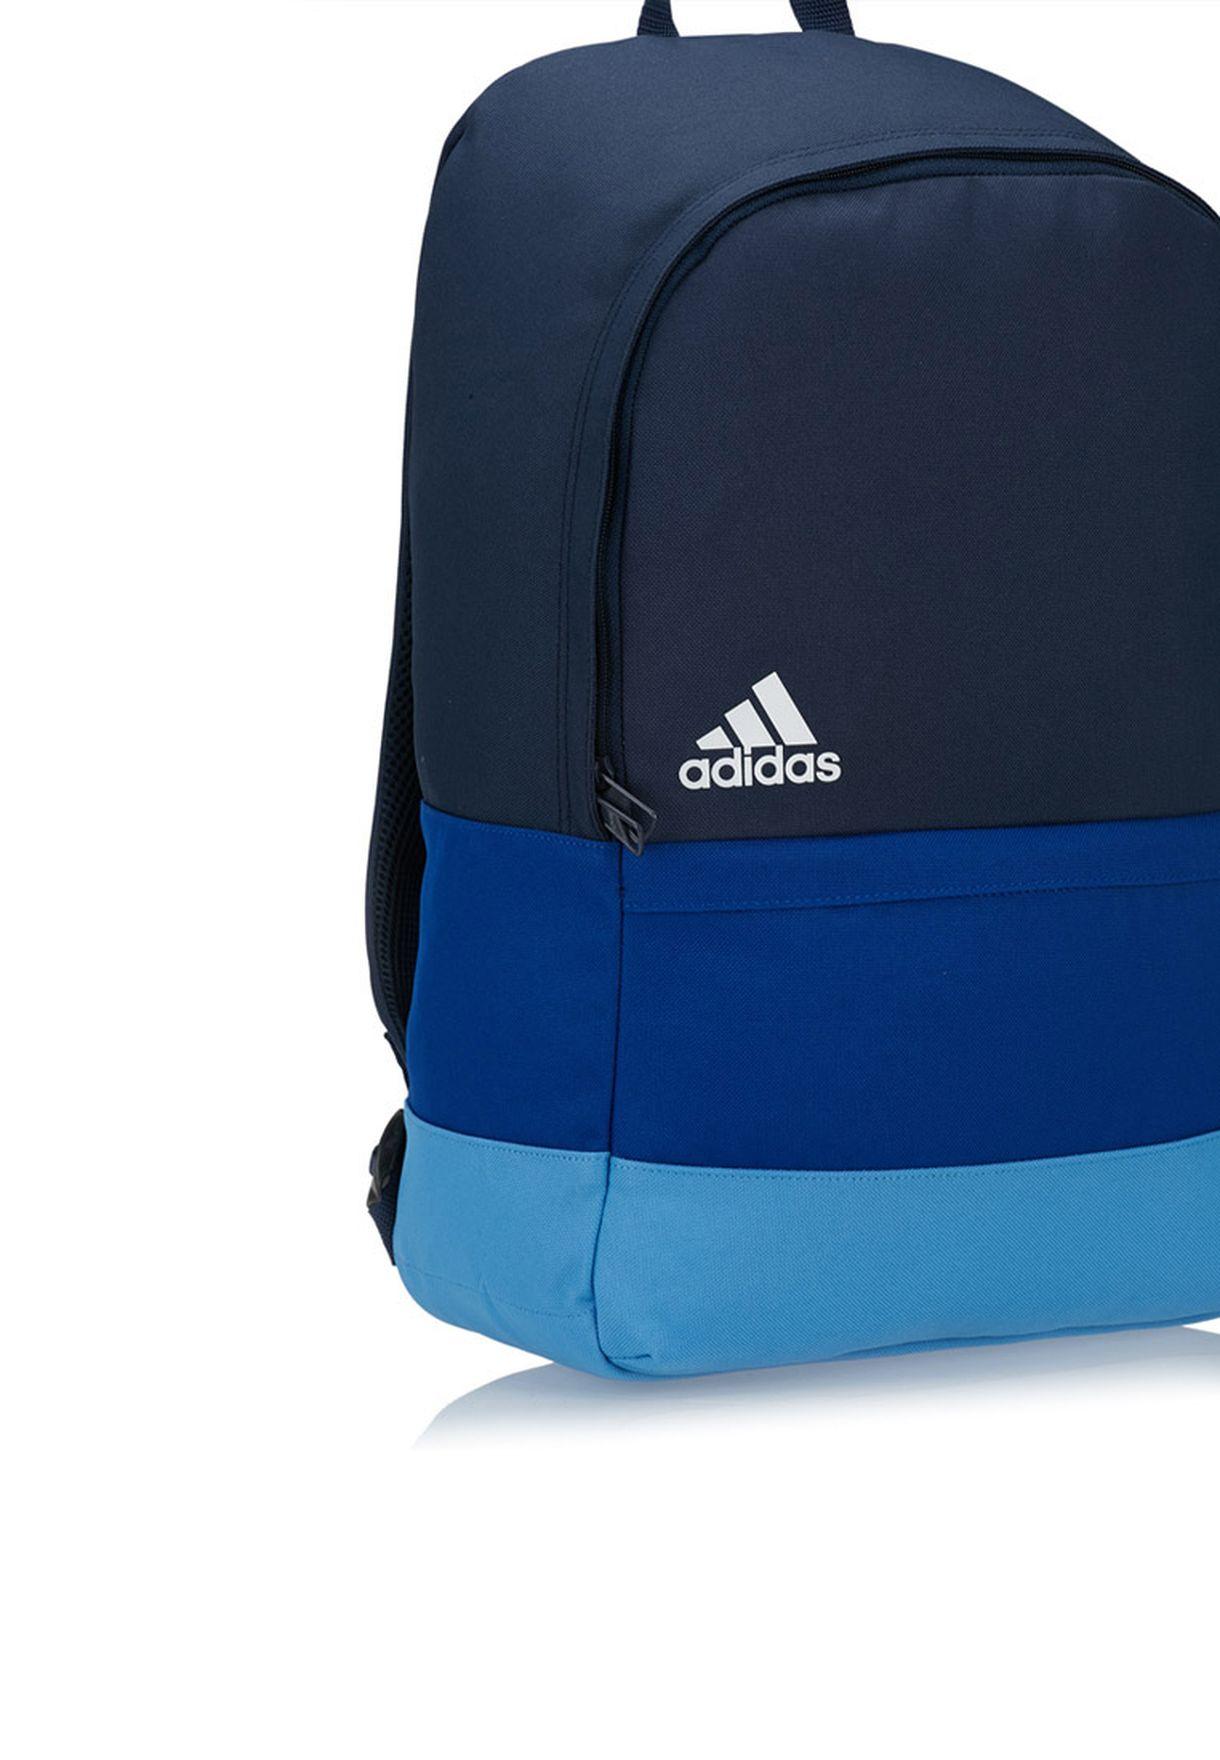 8b28bc923384 Shop adidas multicolor Versatile Block Backpack S19235 for Men in ...